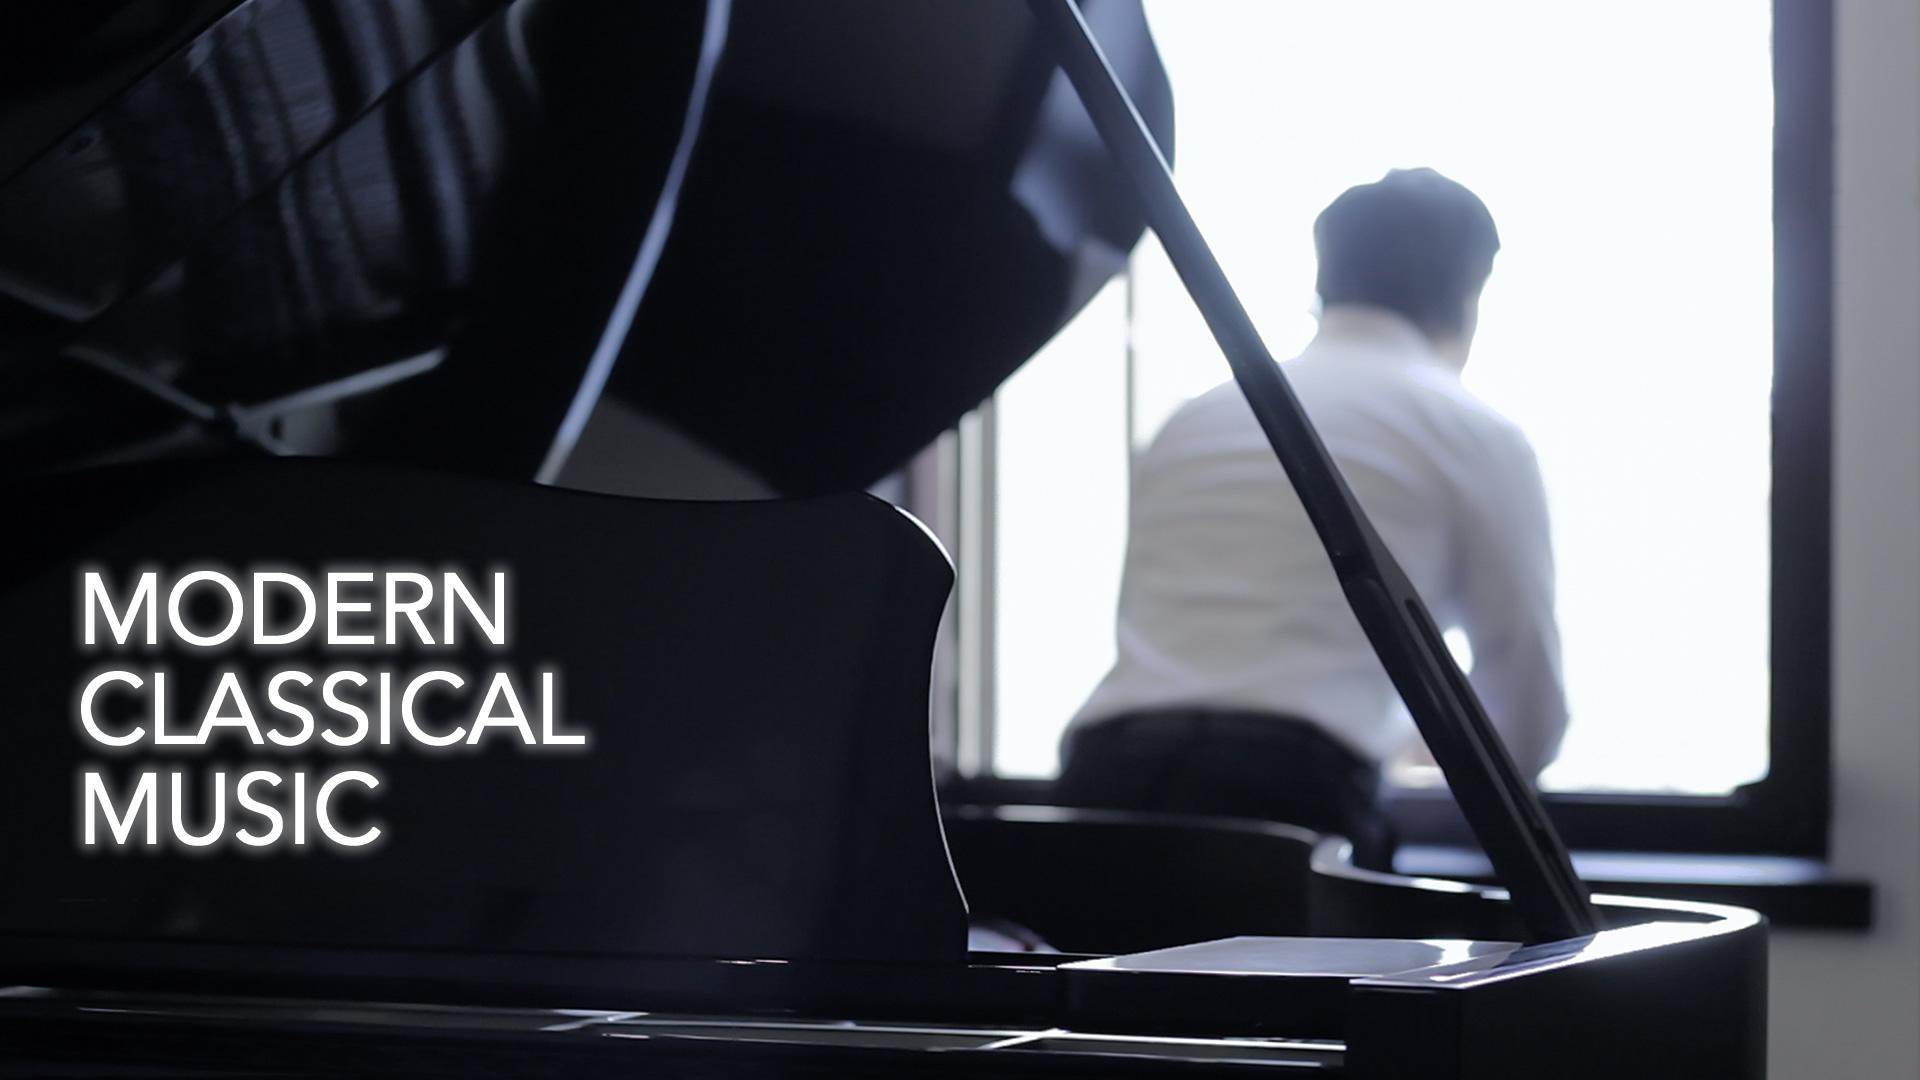 Modern classical music